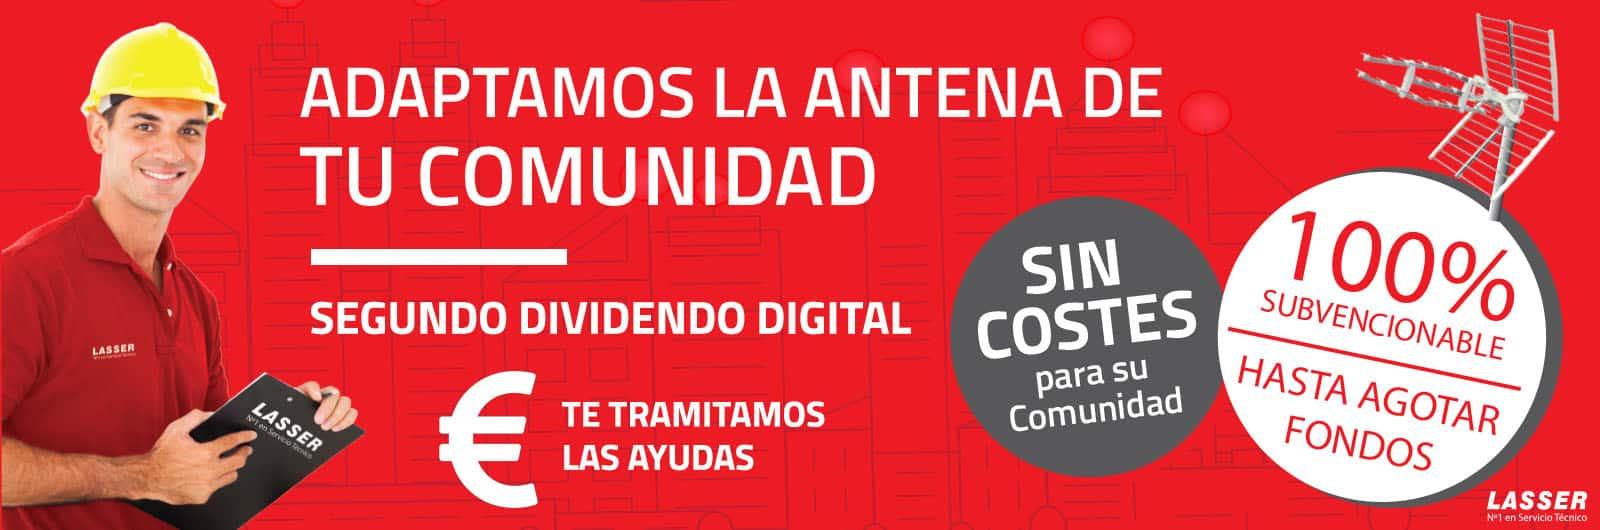 segundo-dividendo-digital-antena-comunidades-promocion-madrid